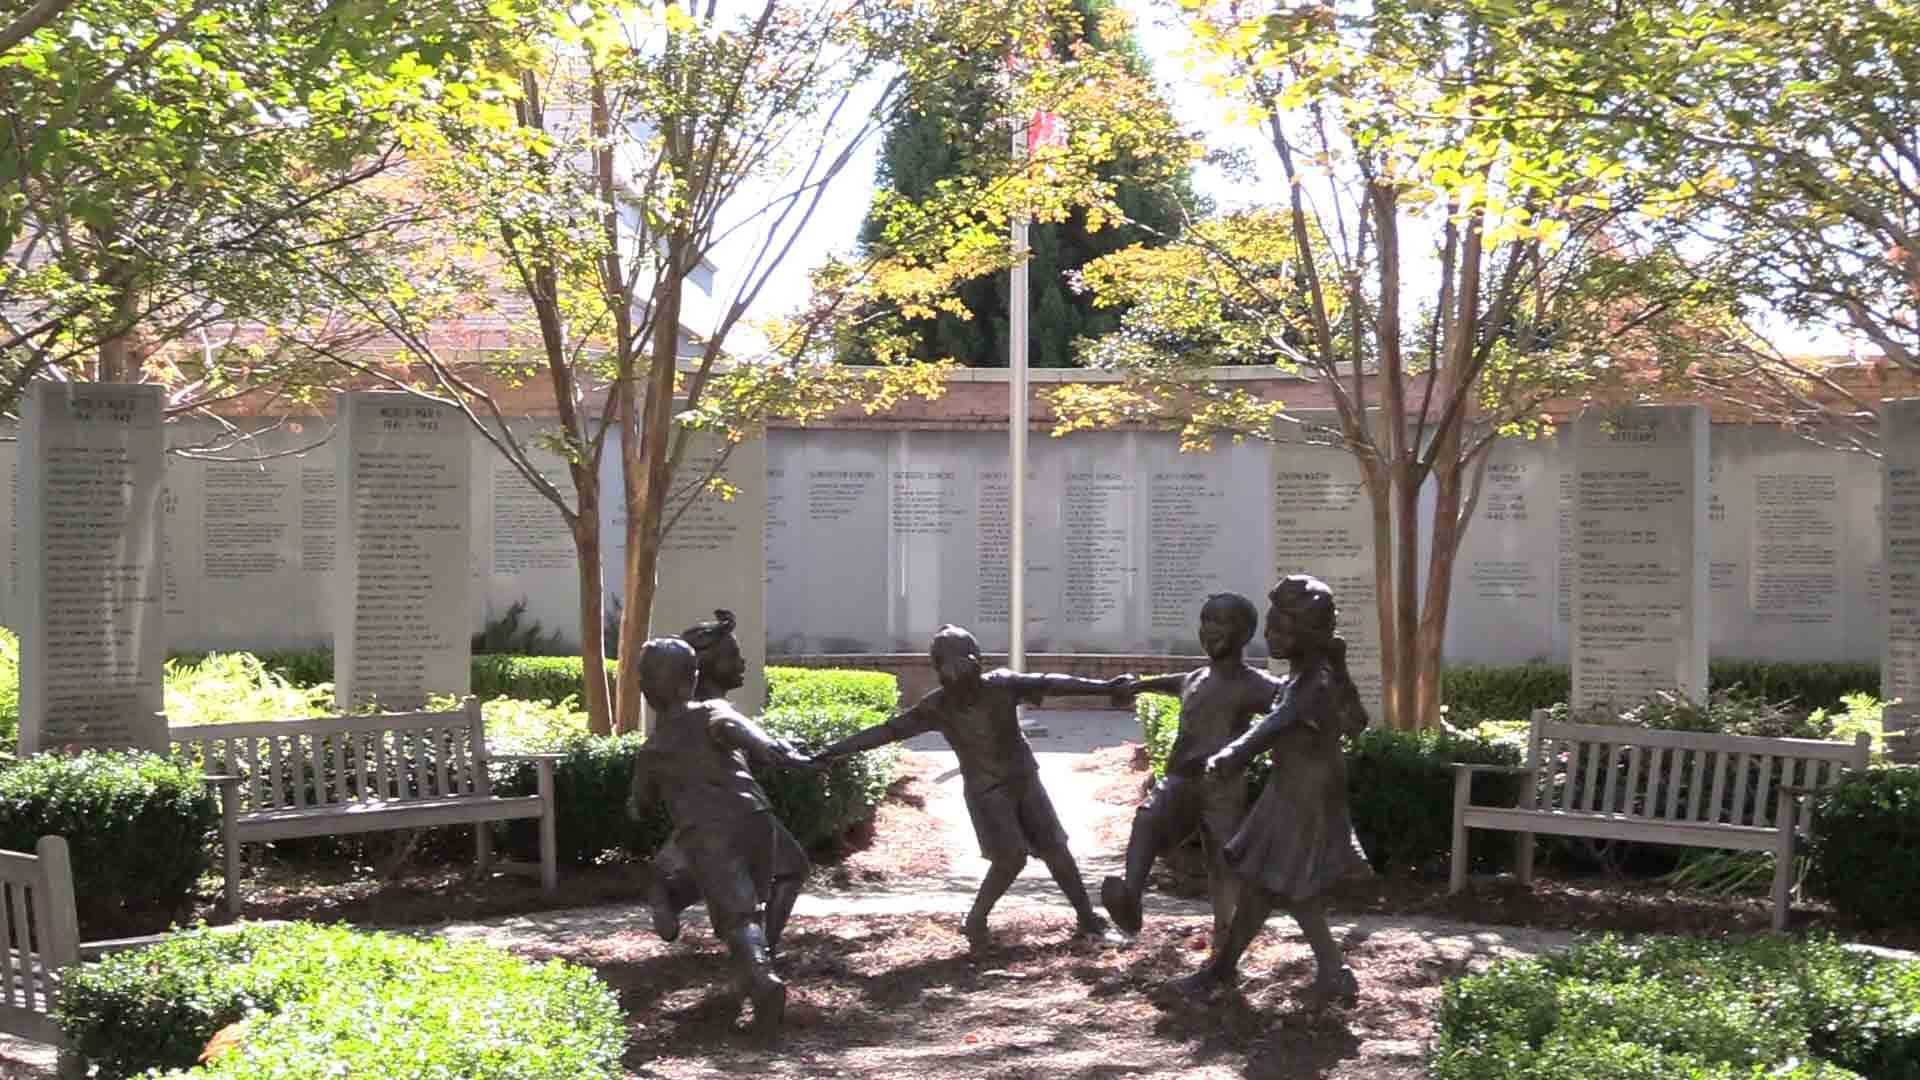 The American Freedom Garden